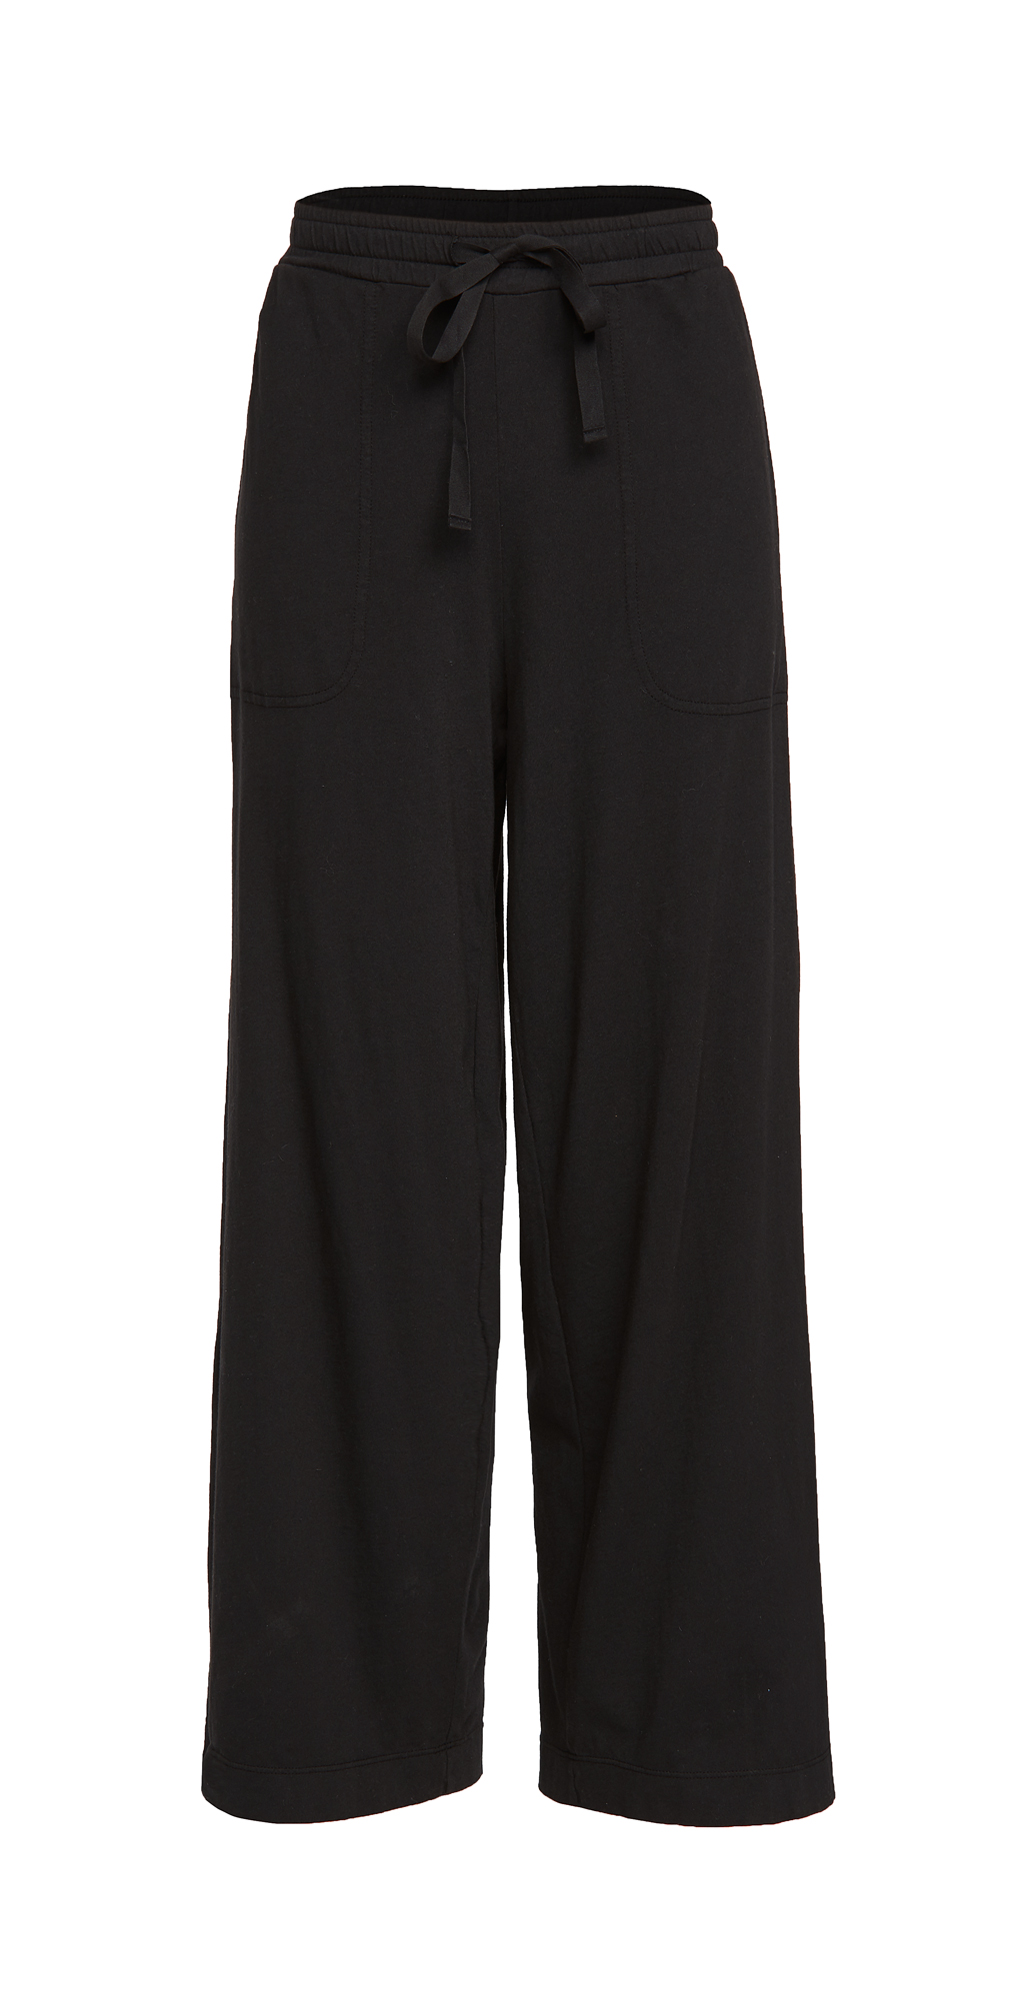 Velvet Pismo Jersey Pants